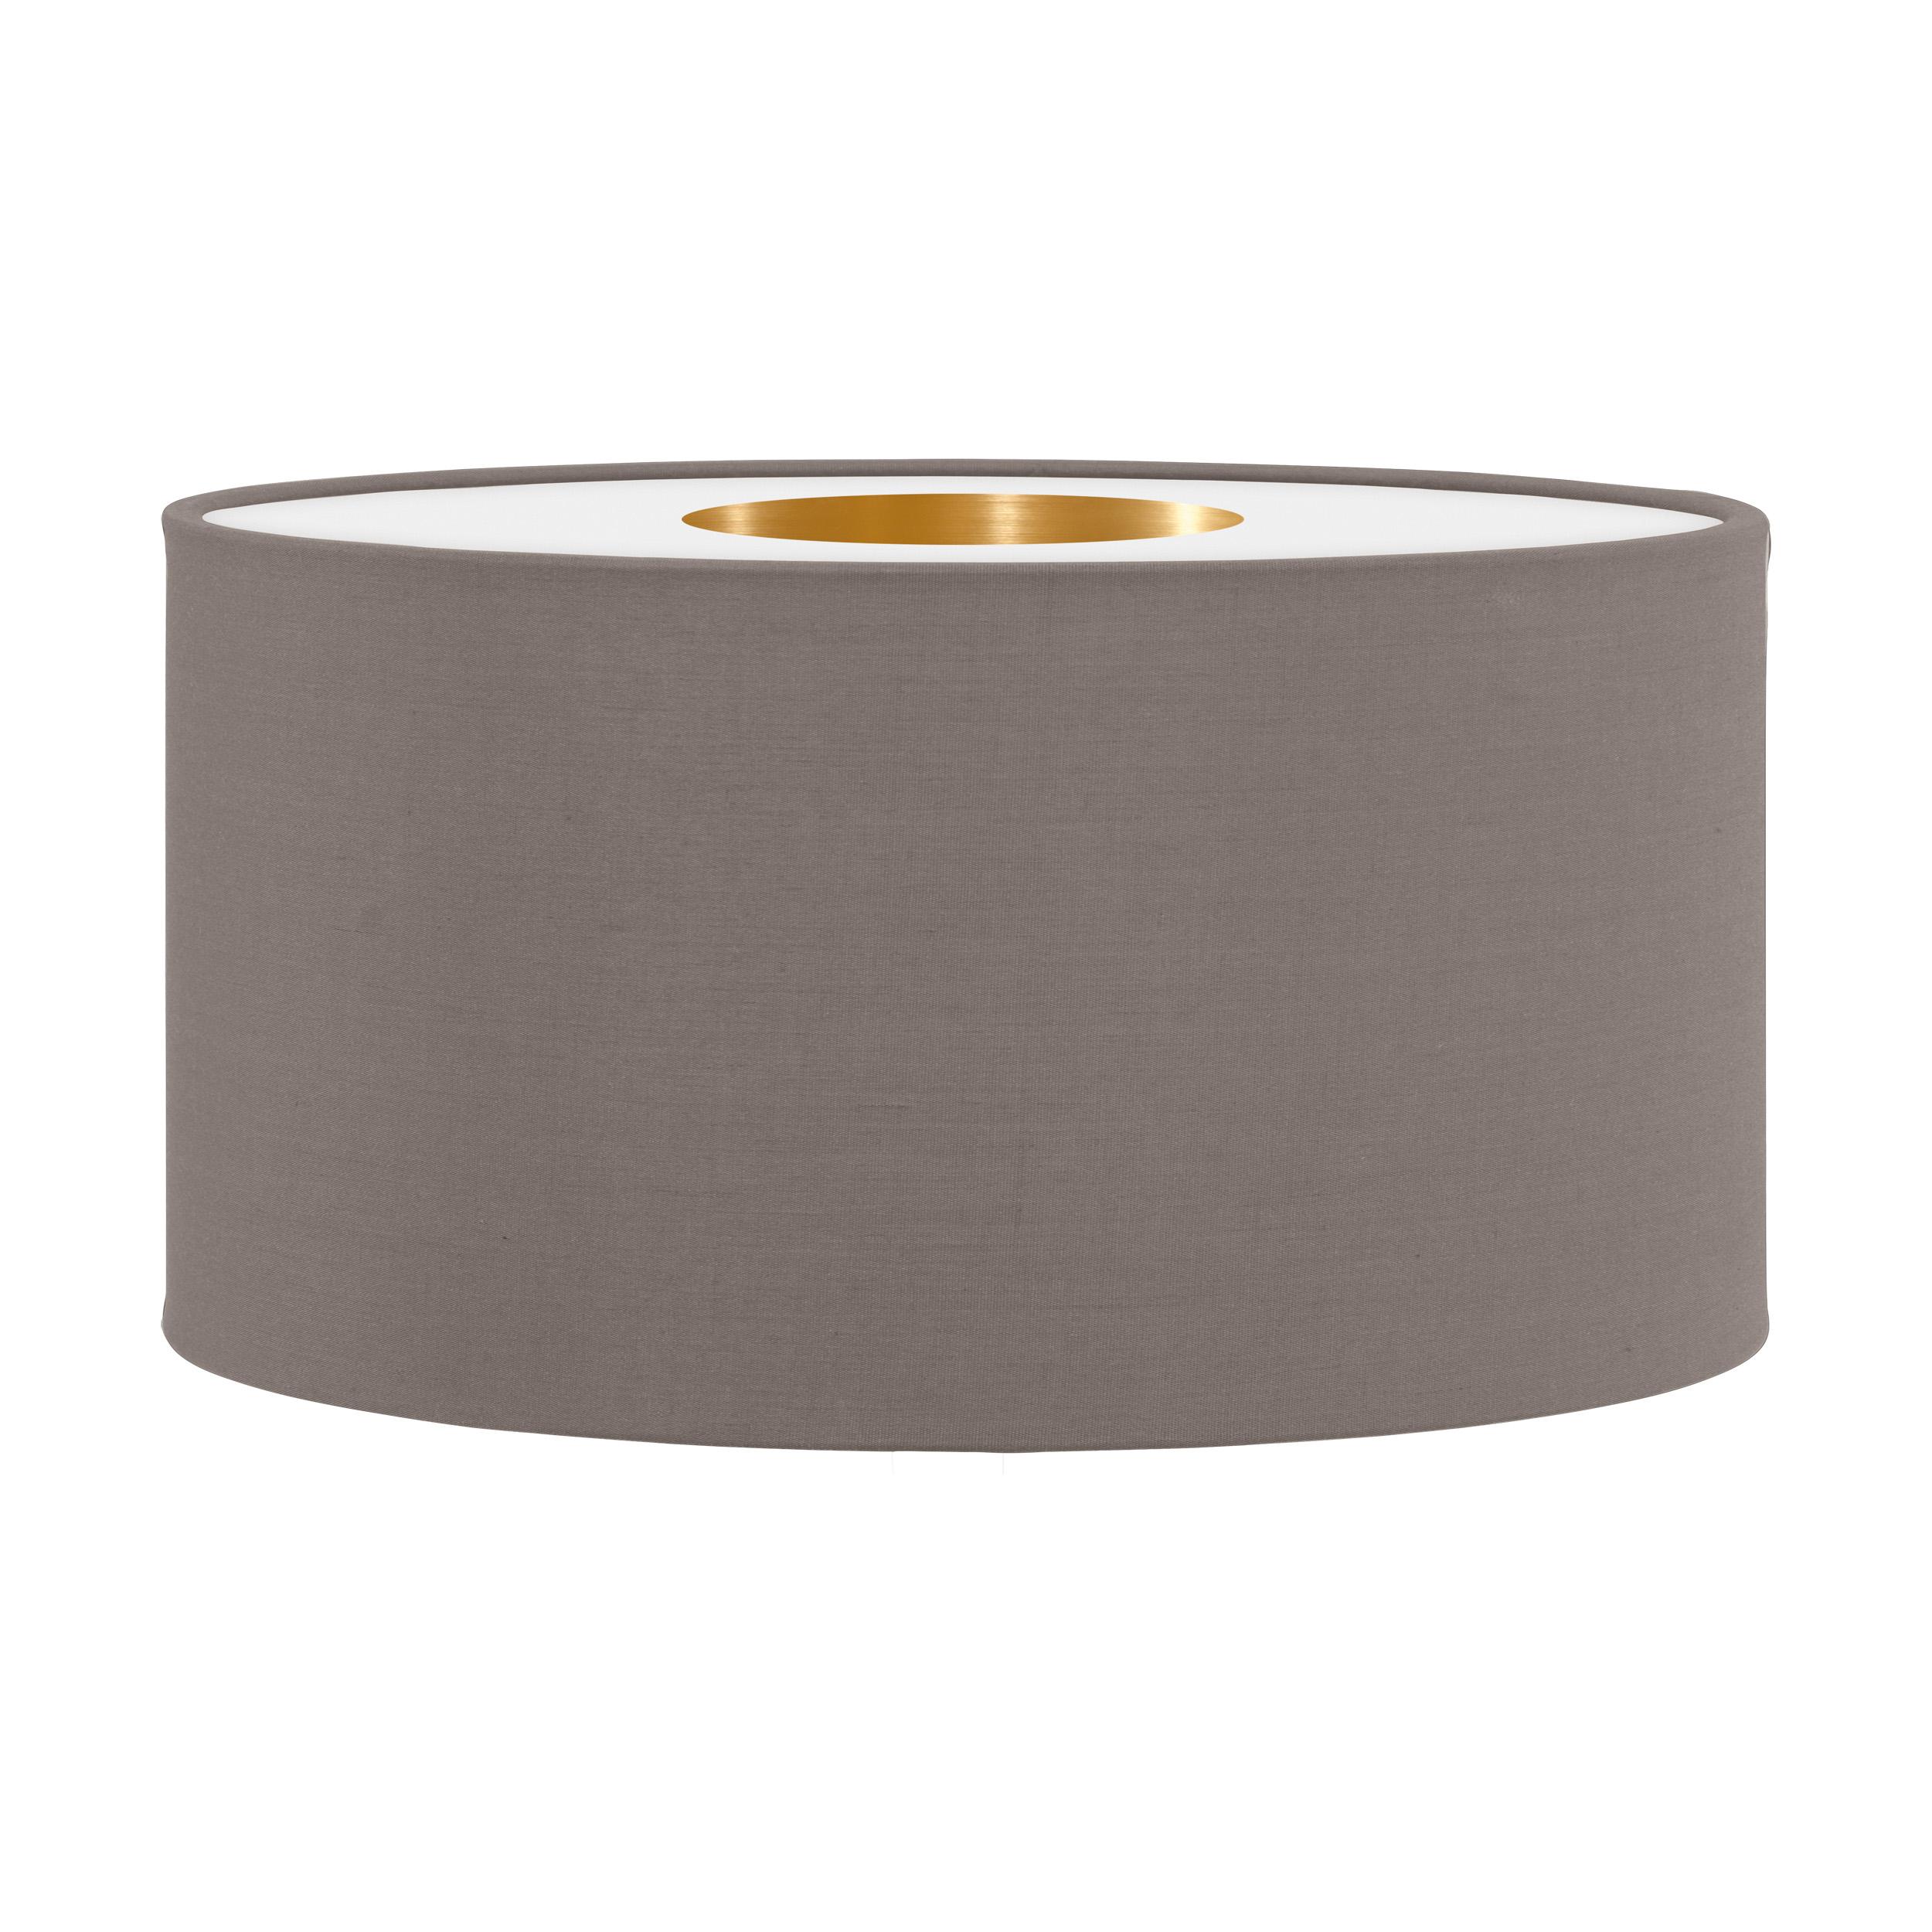 1 Stk Schirm Pasteri Pro inkl. Diffuser cappuccino/gold  LI62679---